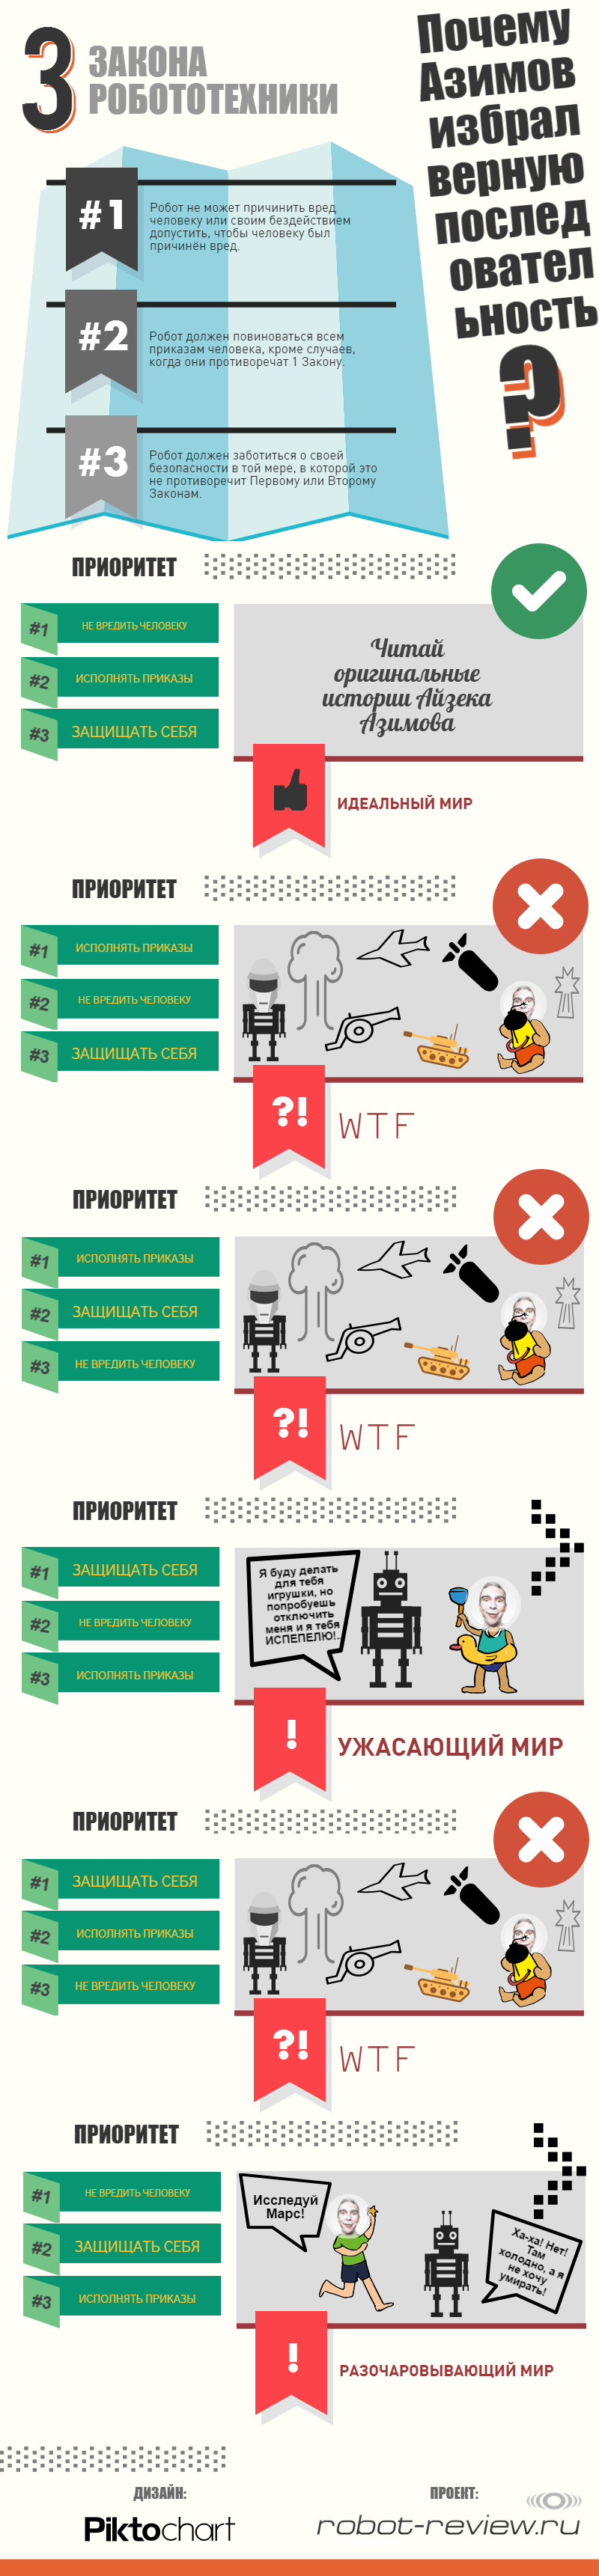 Инфографика: Три закона робототехники